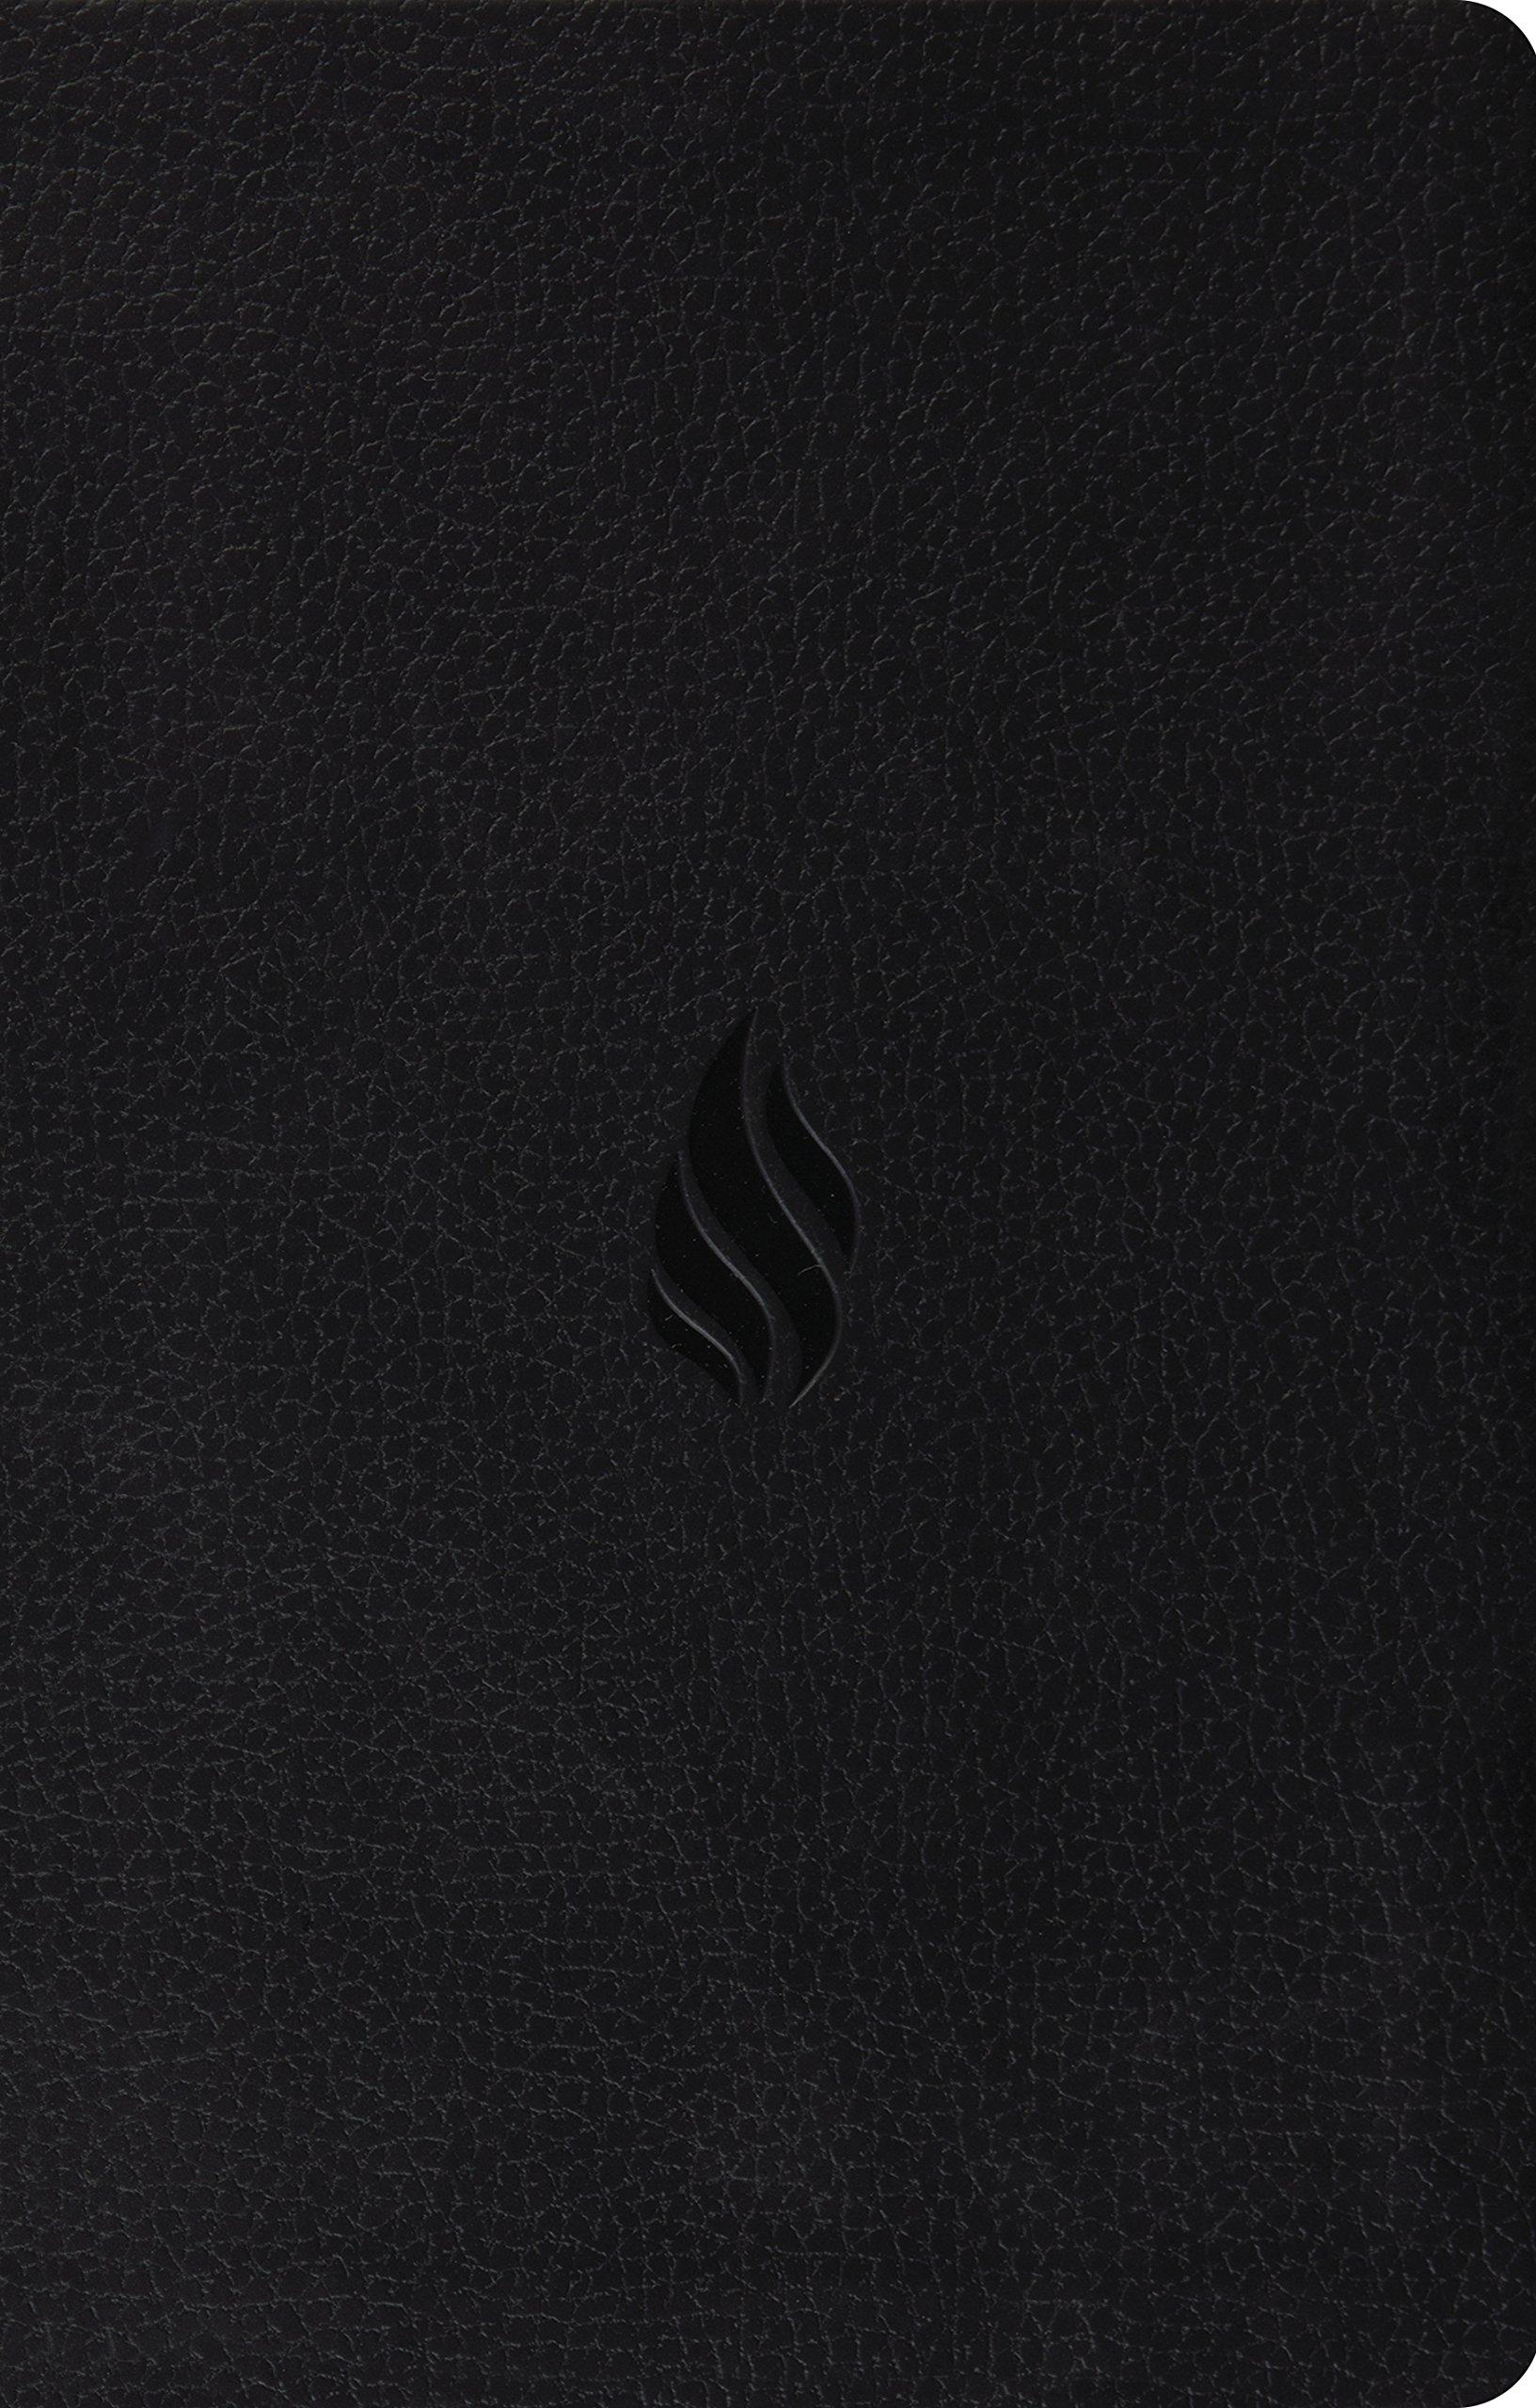 esv premium gift bible trutone midnight flame design